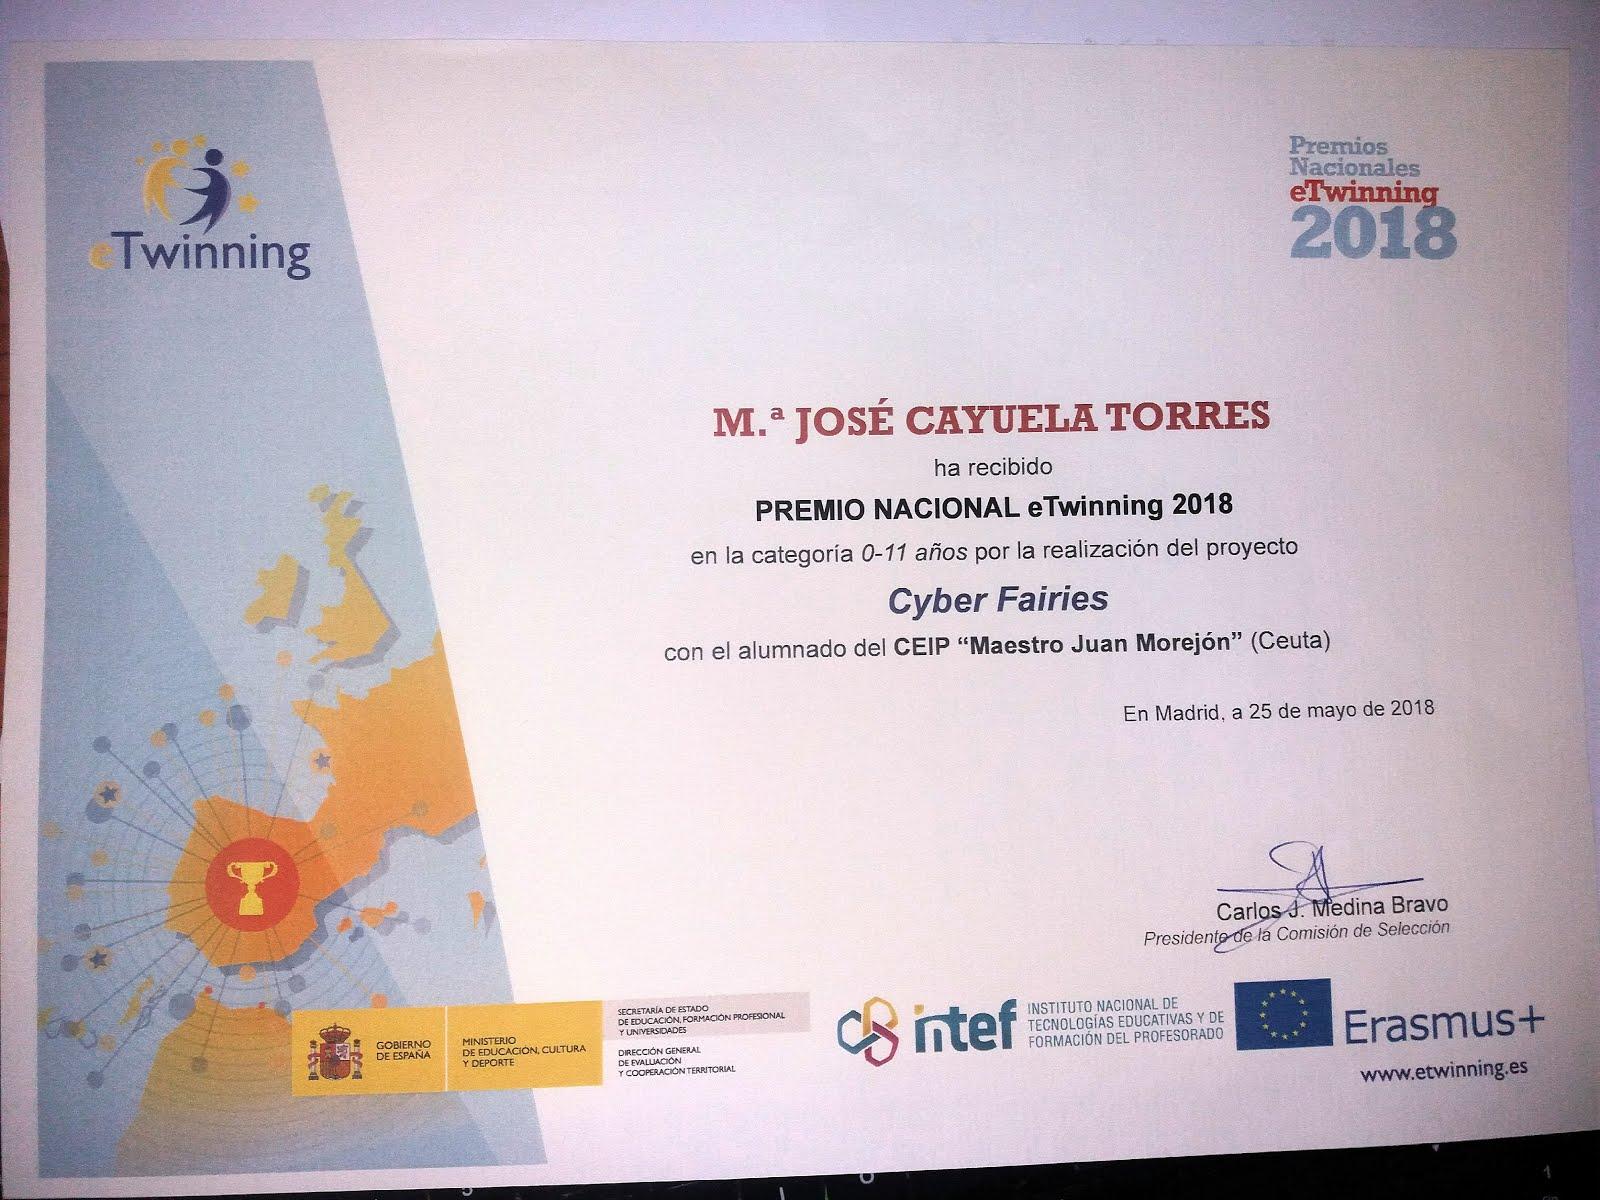 Premio Nacional eTwinning 2018 para Cyber Fairies.